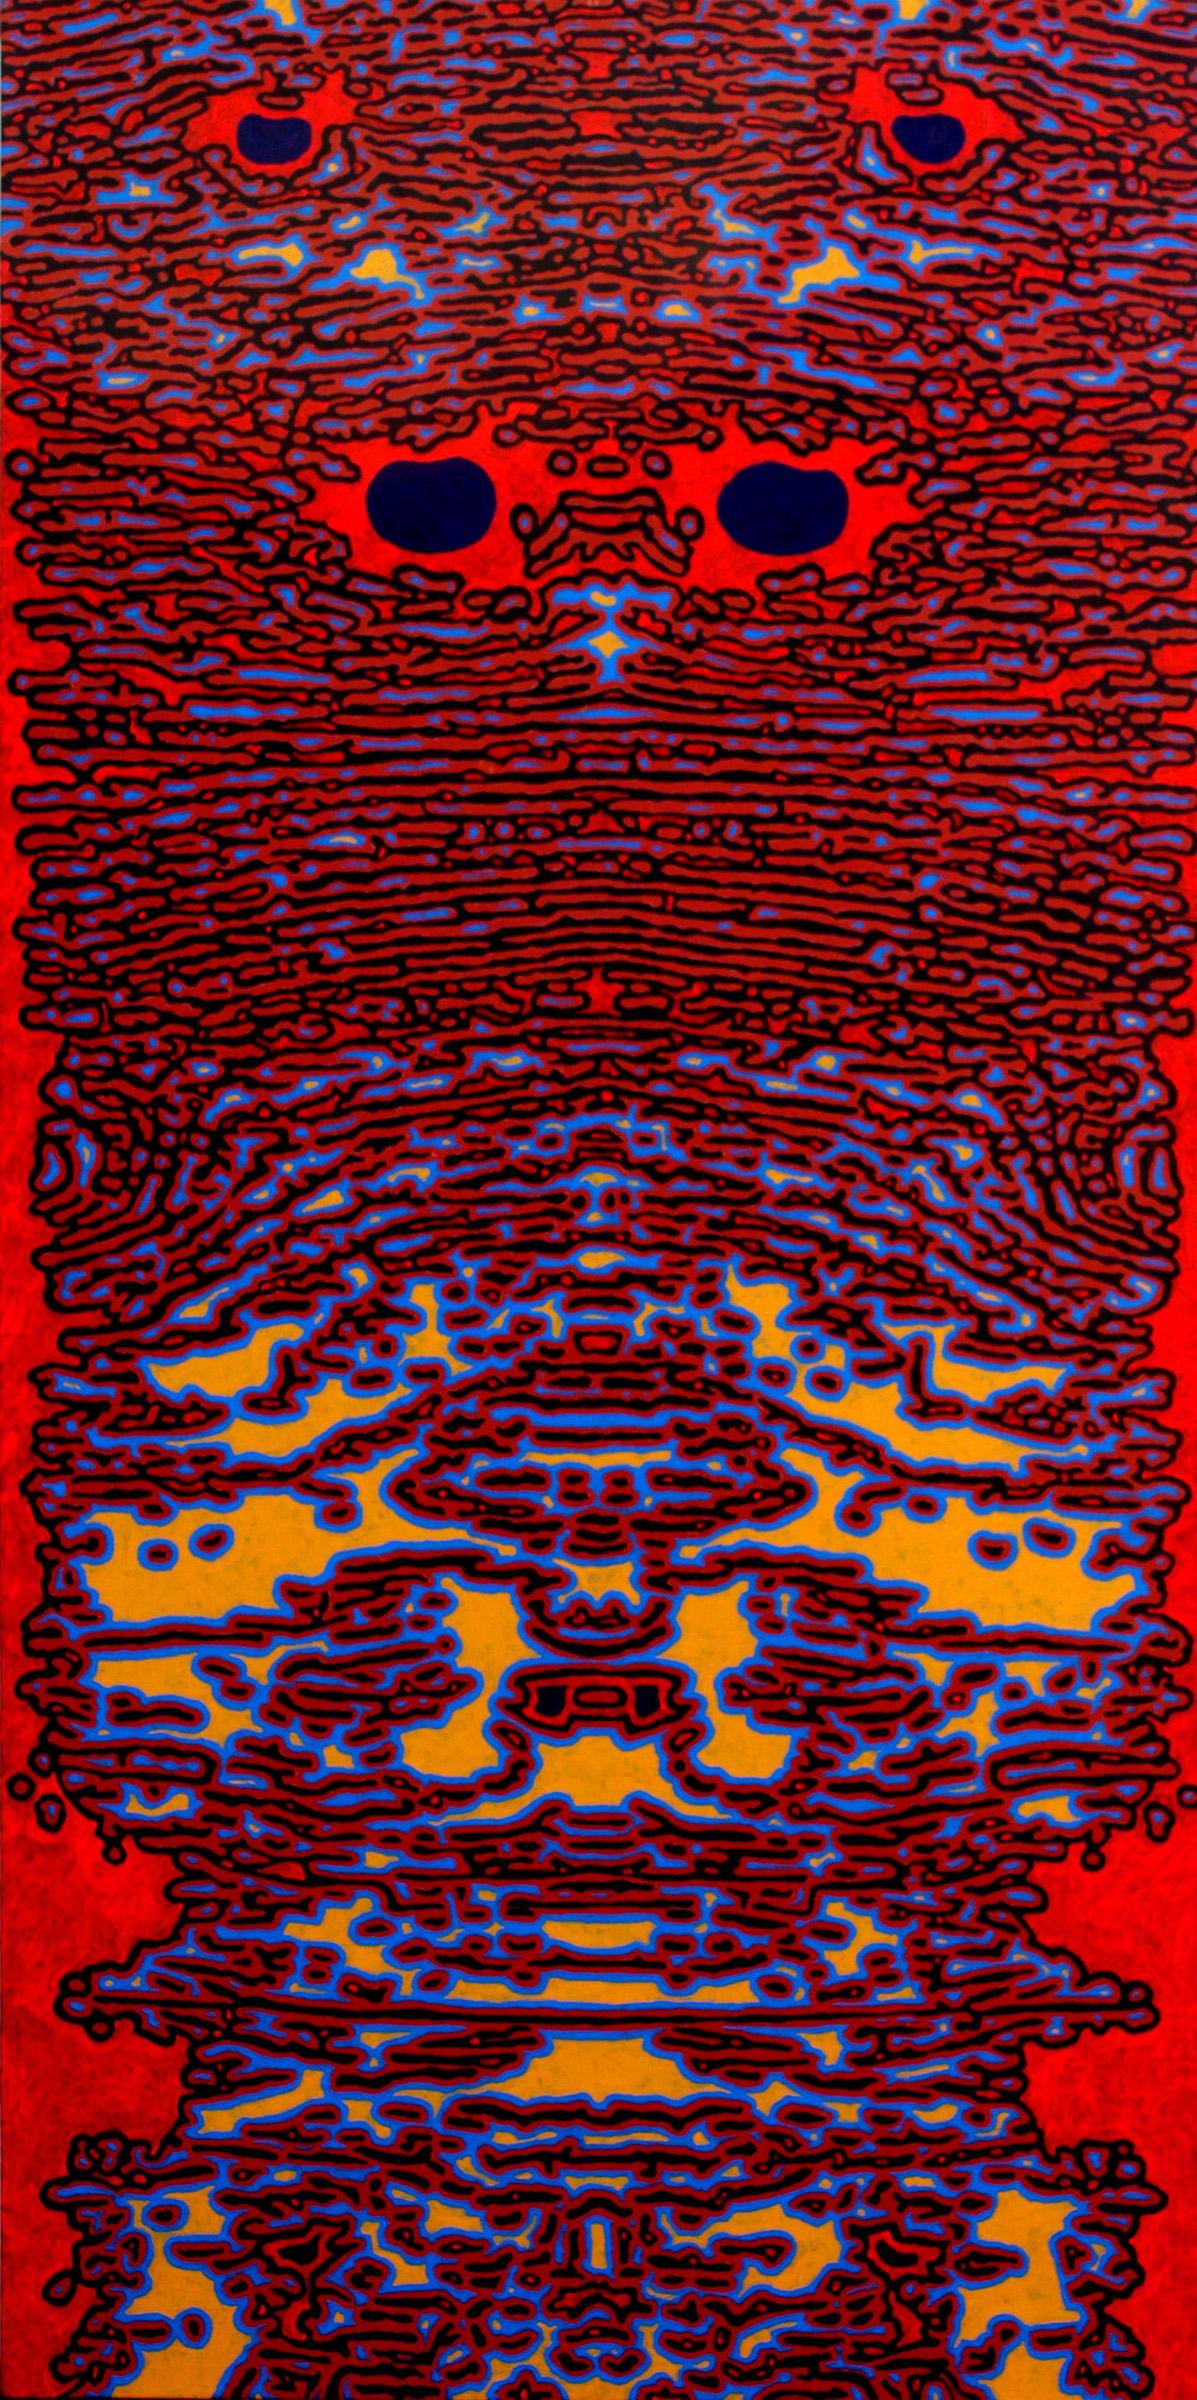 Megaera